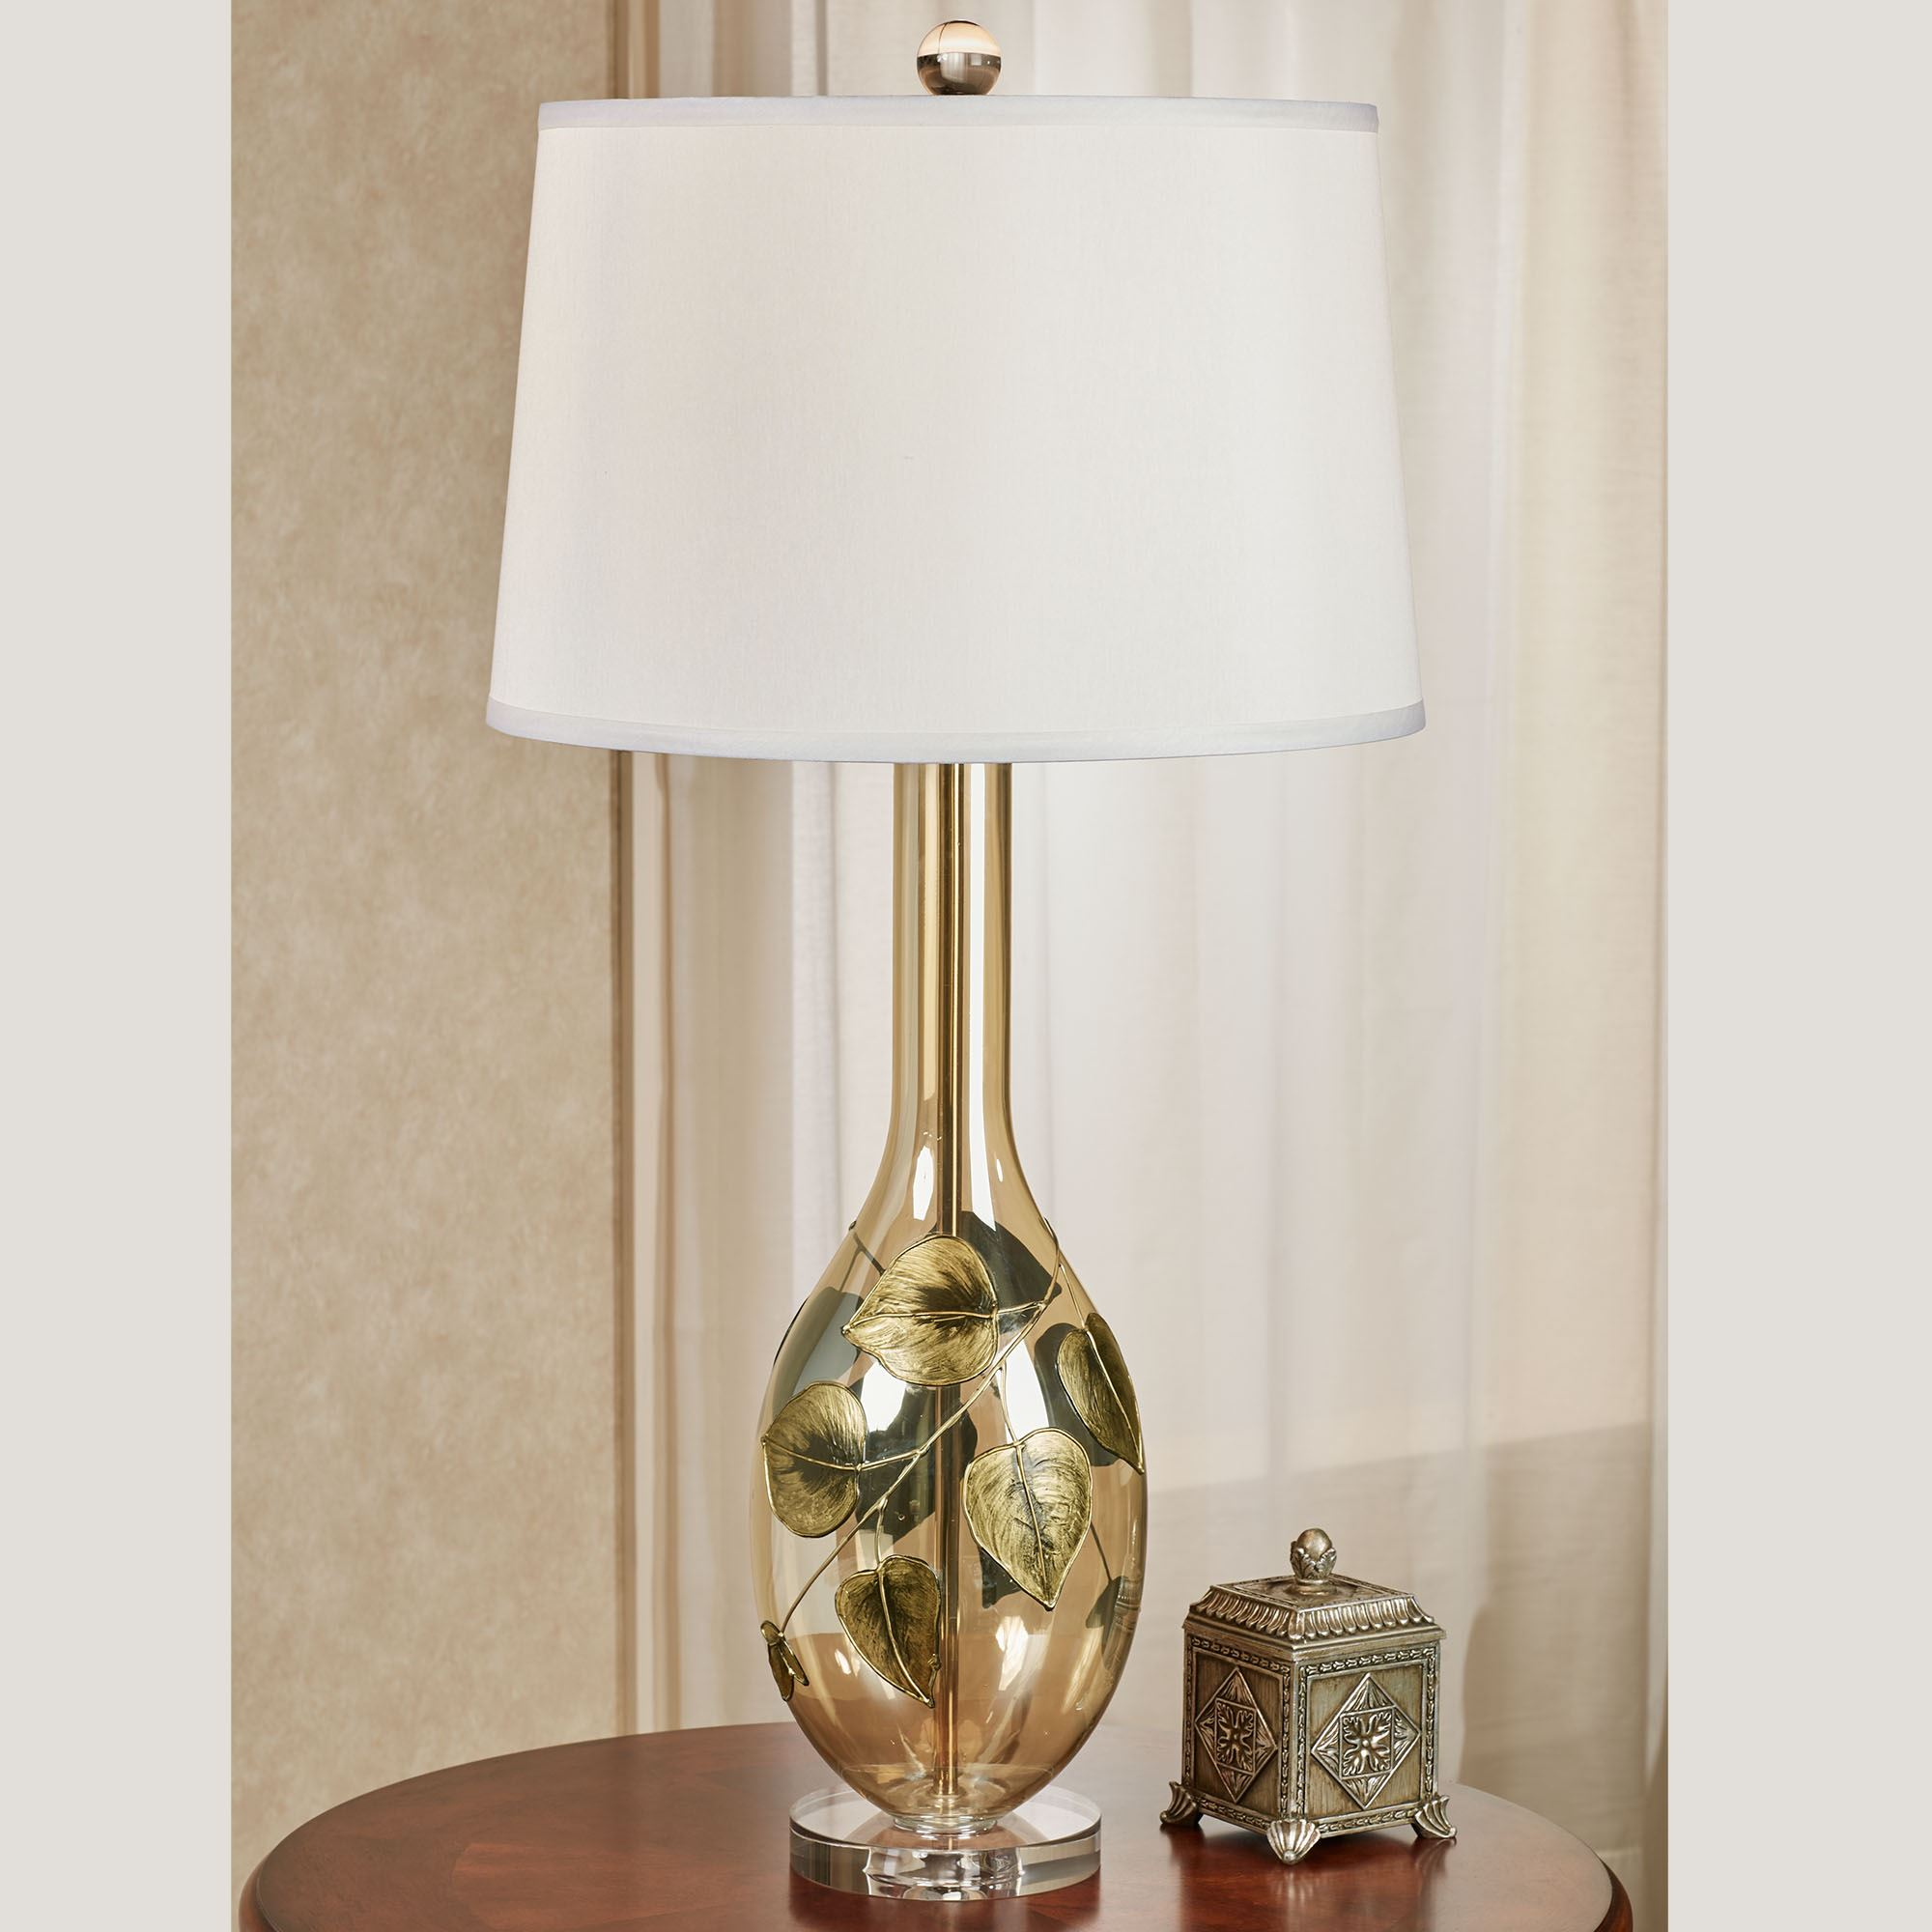 Rustic Leaves Crystal and Metal Table Lamp